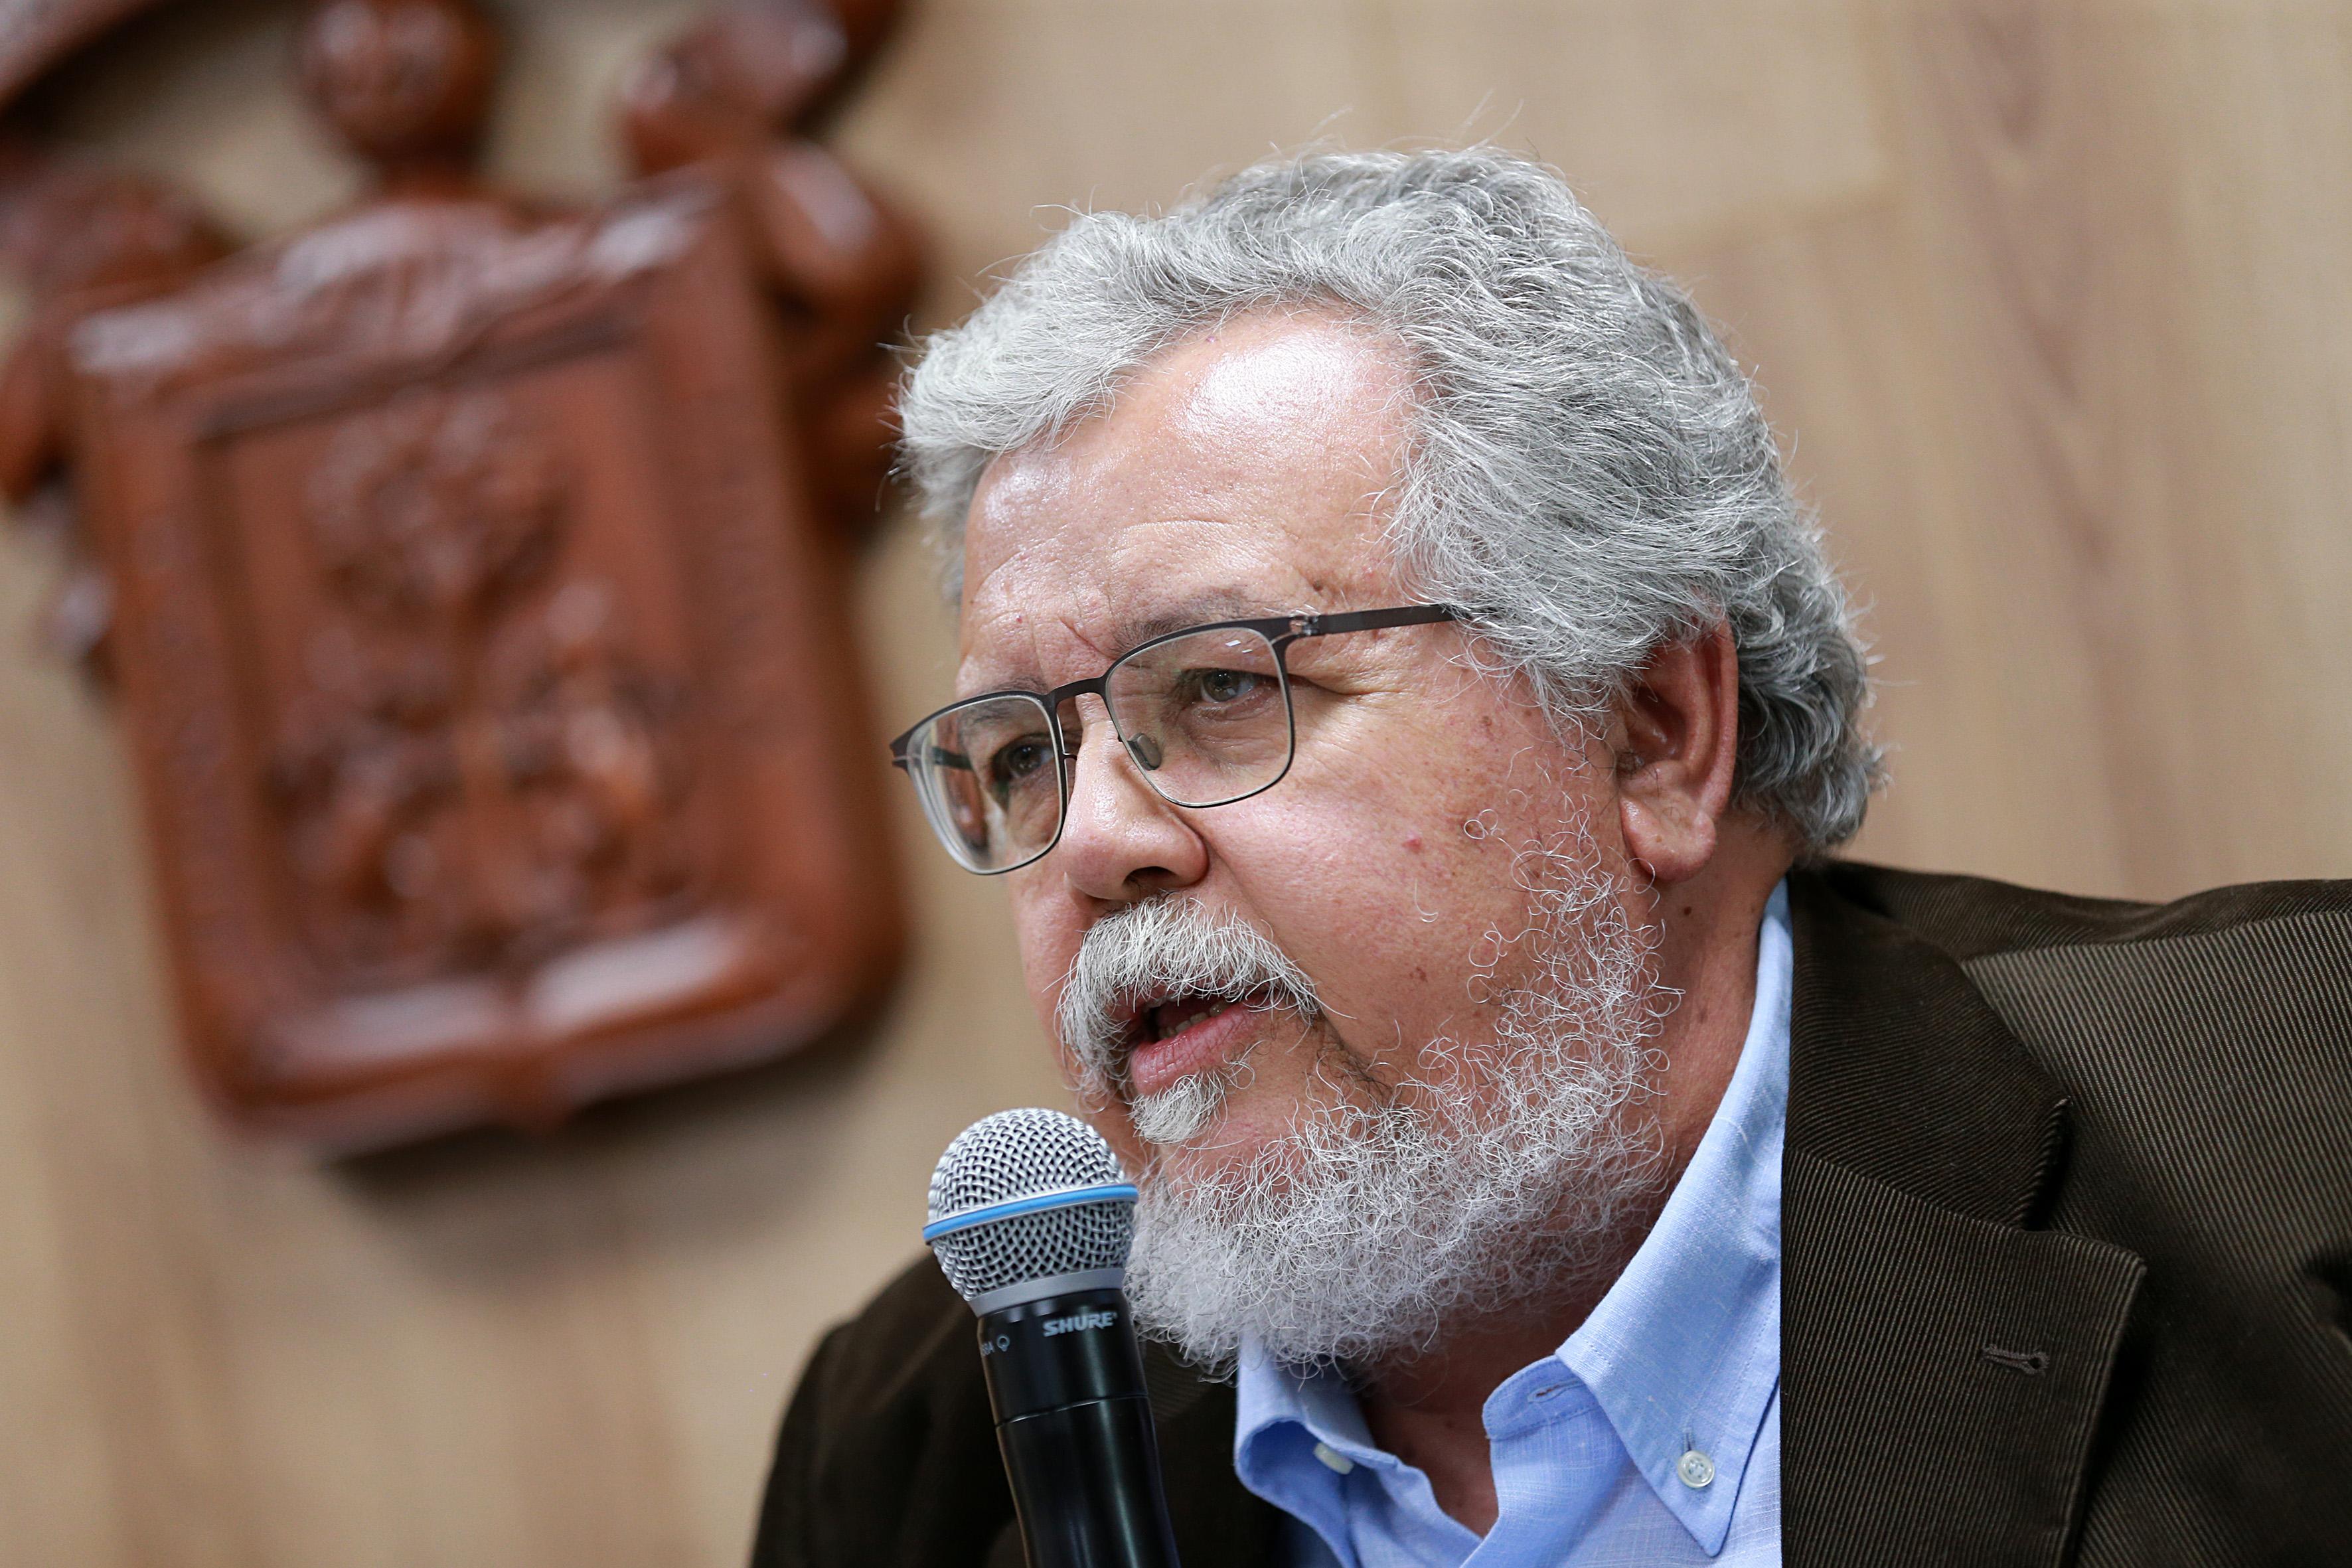 Dr. Guillermo Julián González al micrófono, toma cerrada